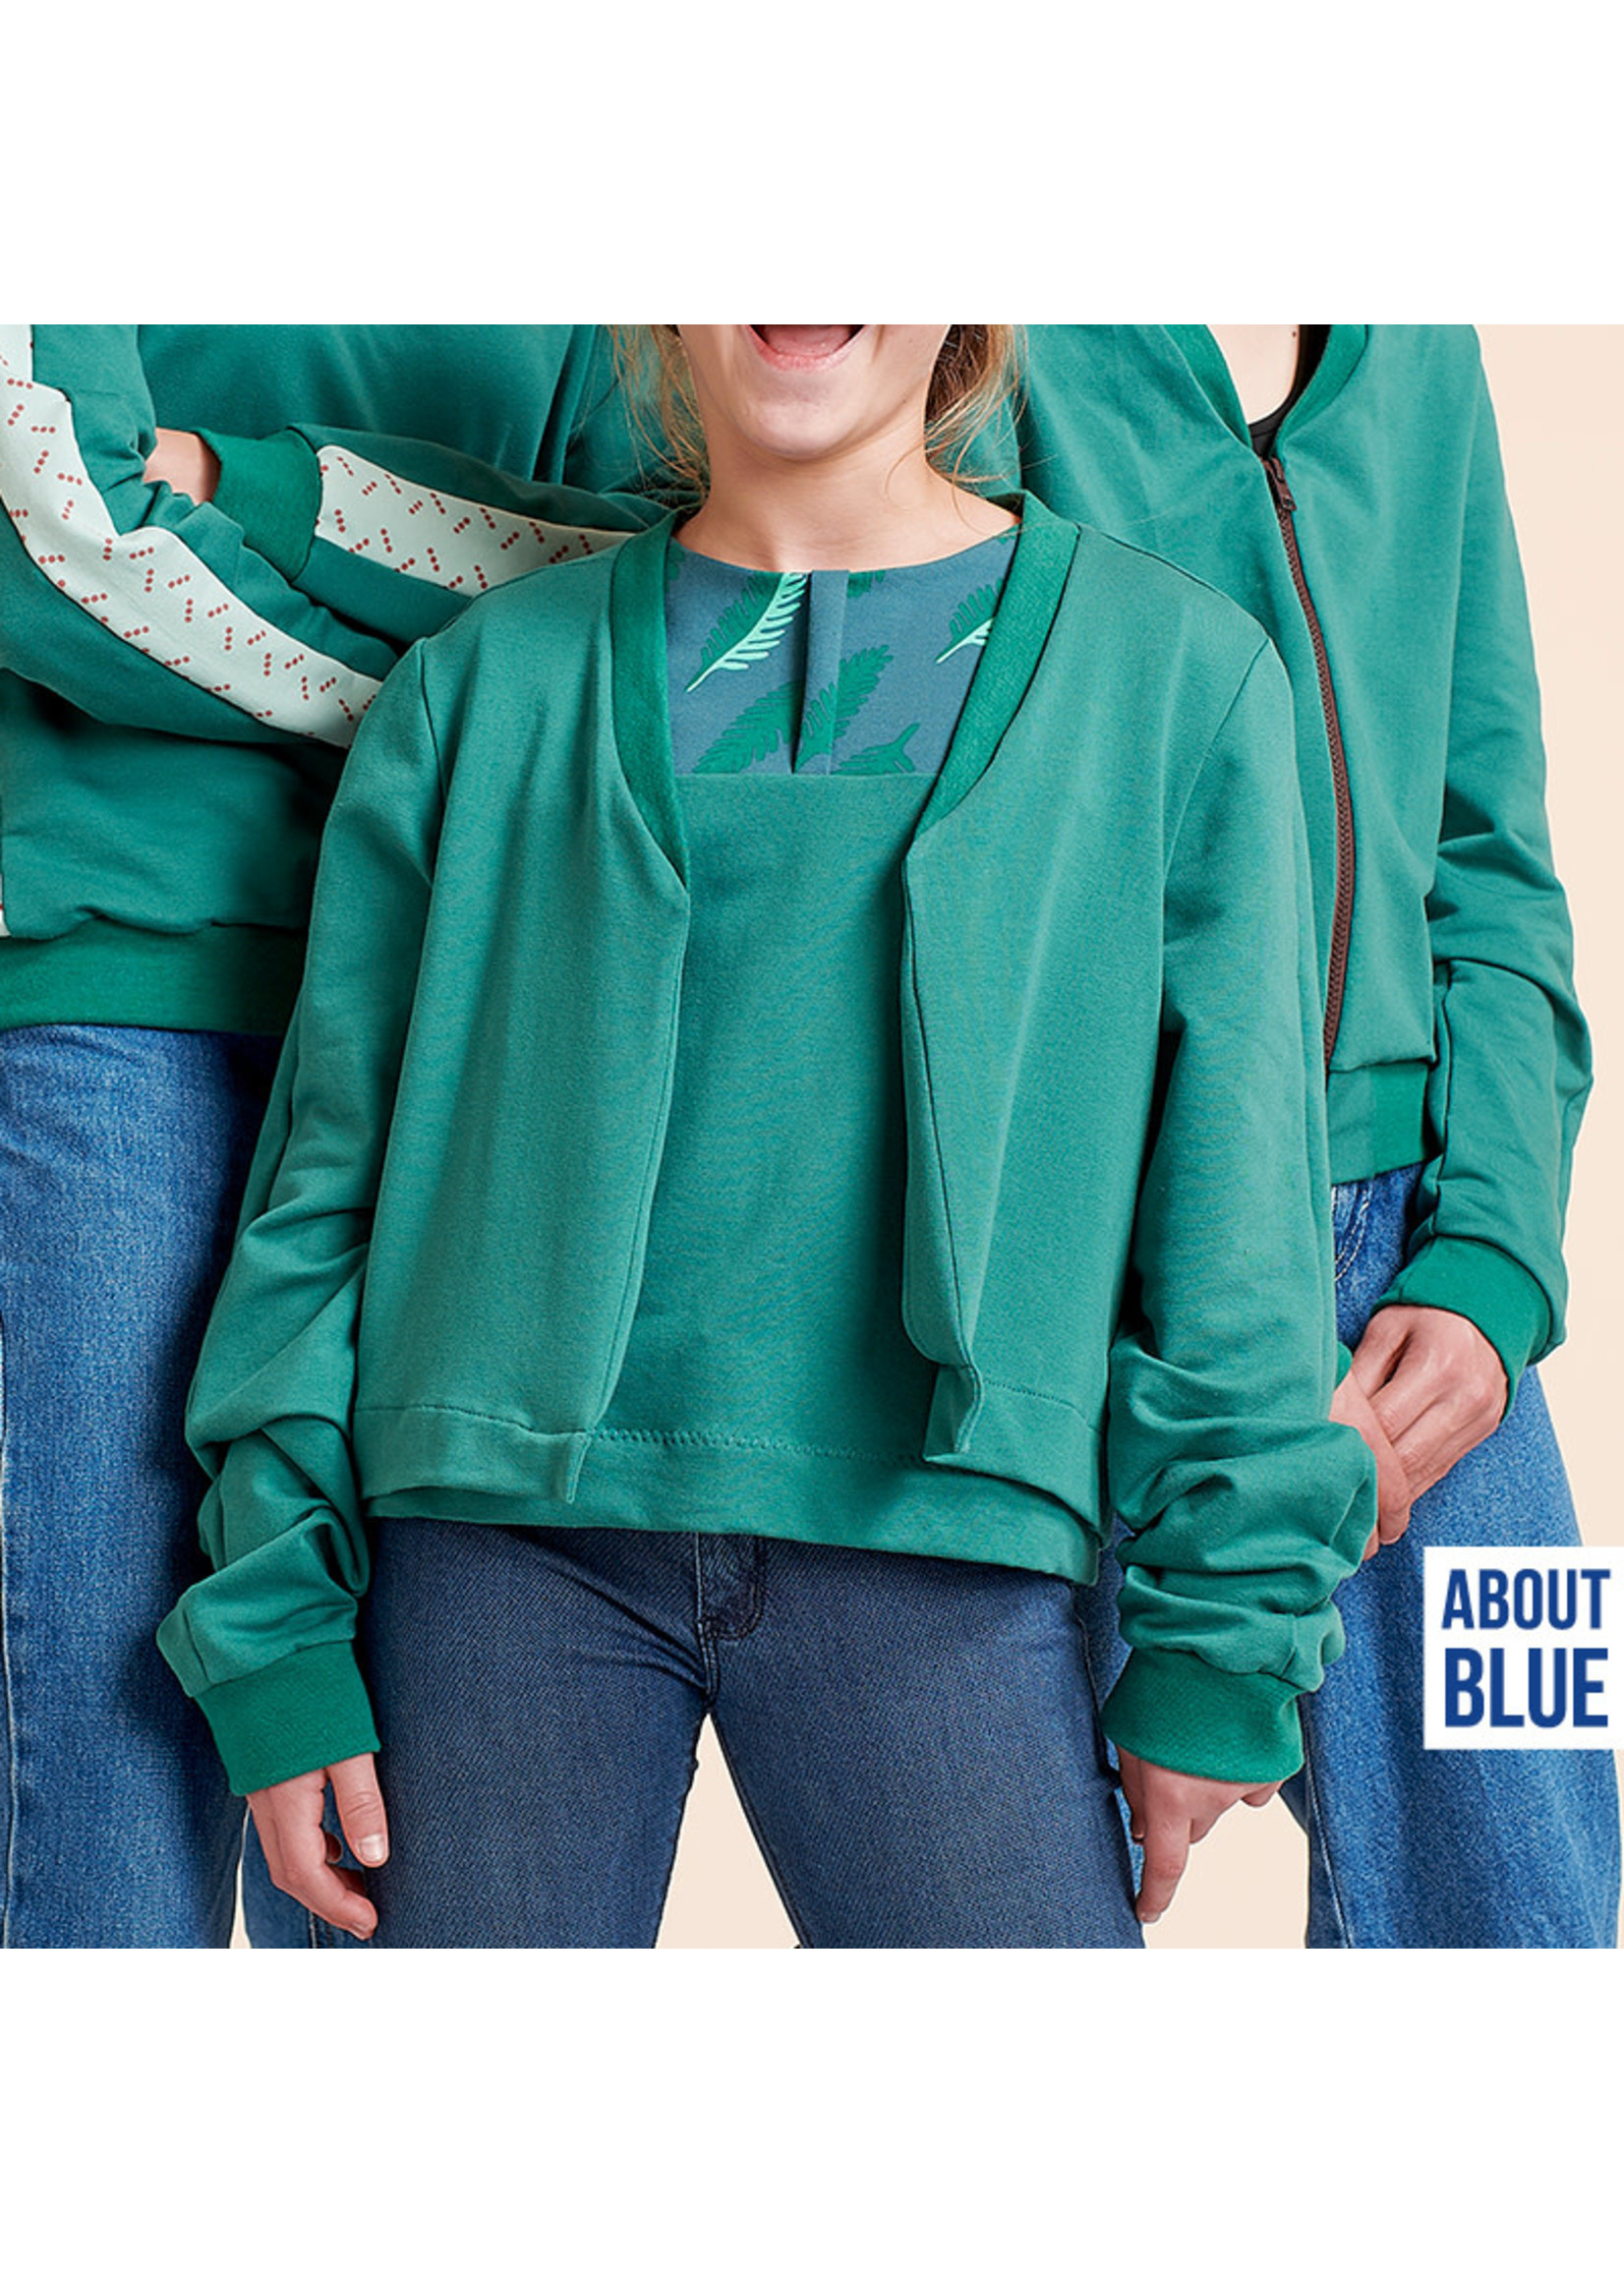 About Blue Fabrics Uni 8 Blue Spruce FT